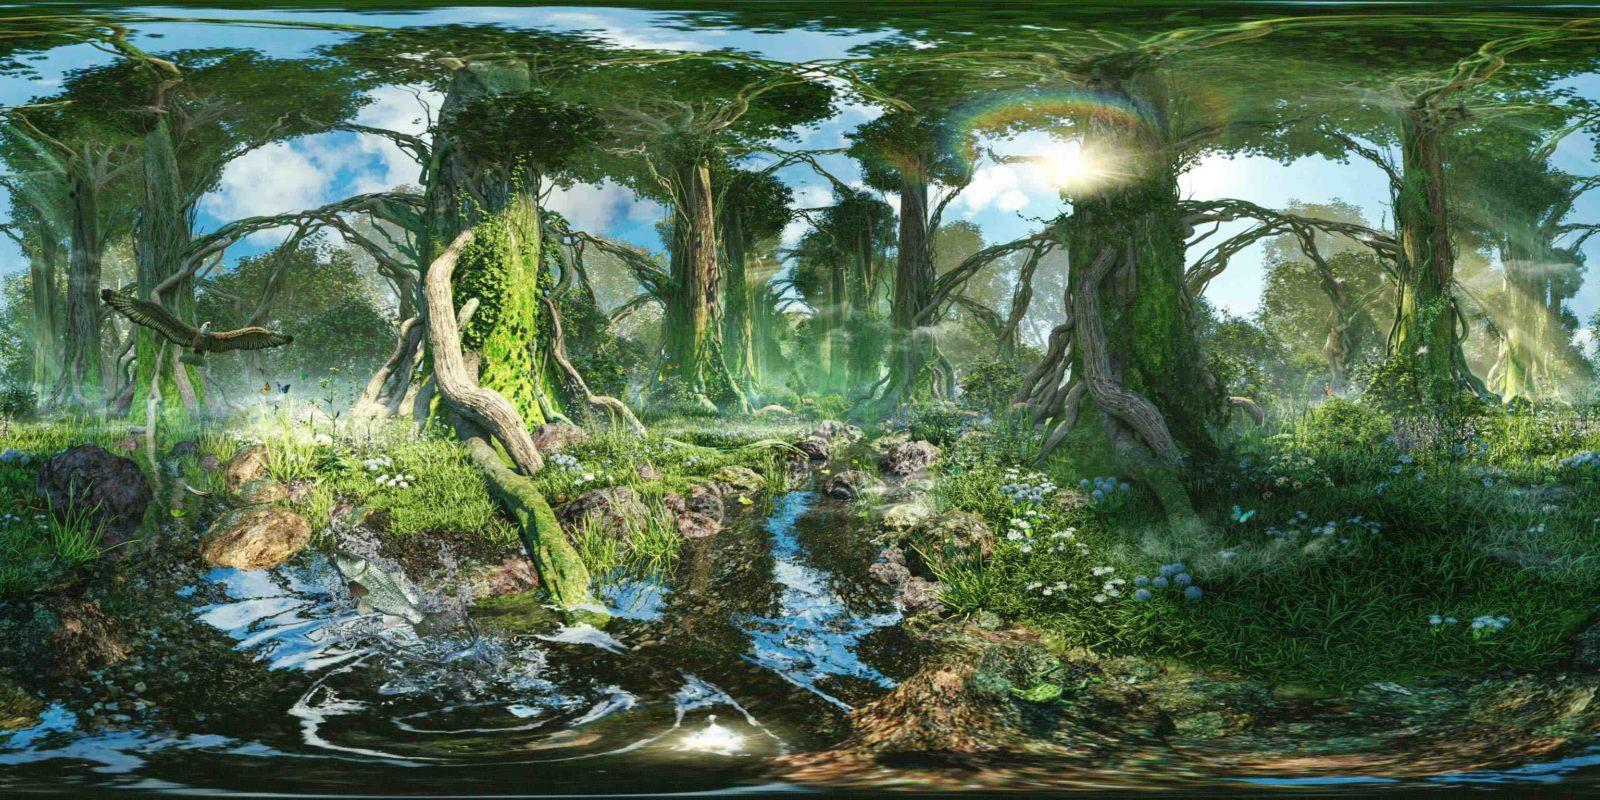 cathedral of woods - Illustration Artwork für die Oculus Rift 360 Grad